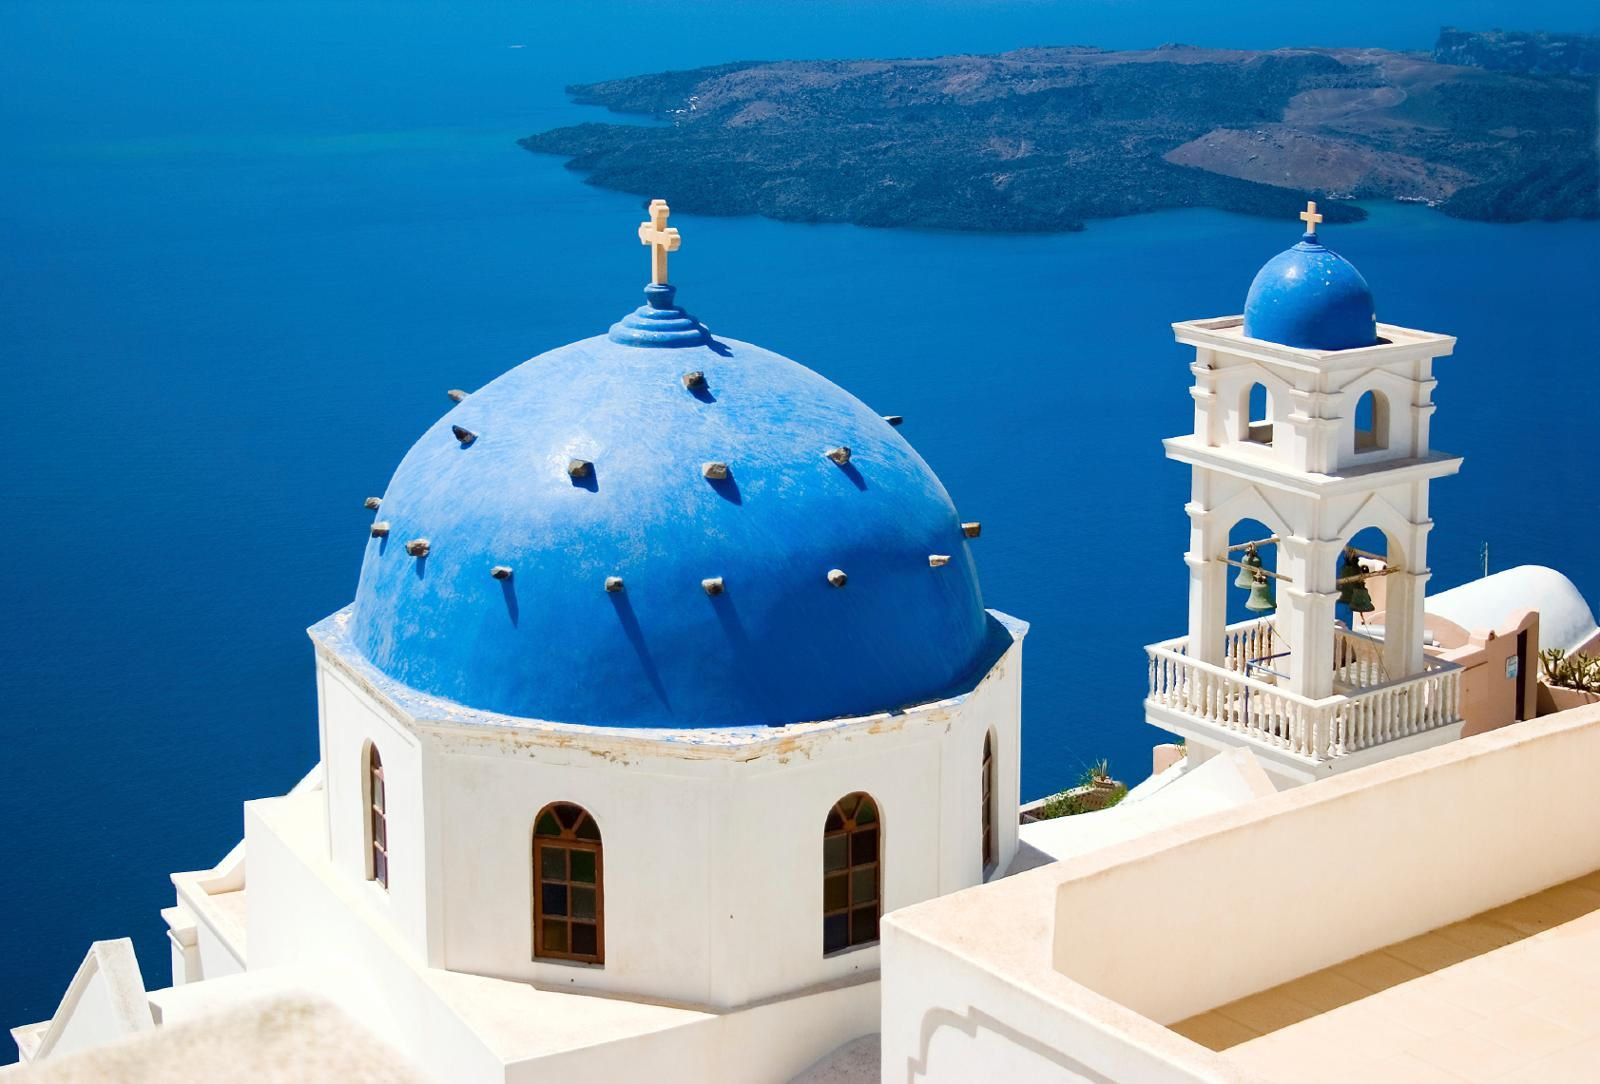 The famous blue of Greece - blue paint against blue sea backdrop ...